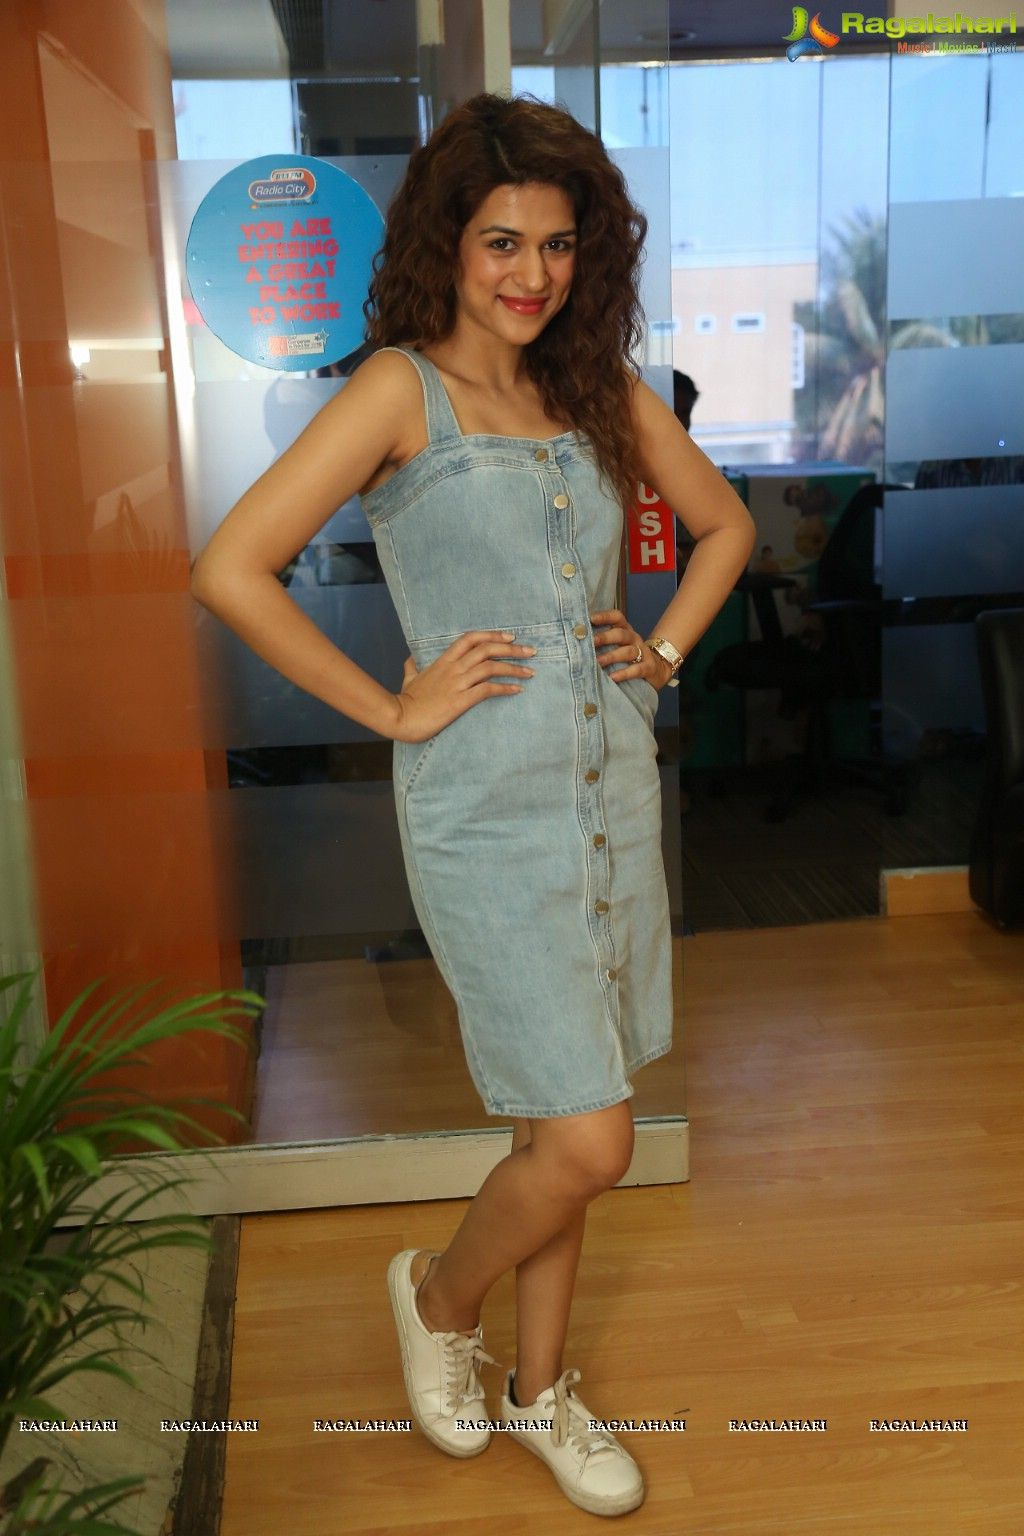 Tamil Actress Shraddha Das Photos - Image 84